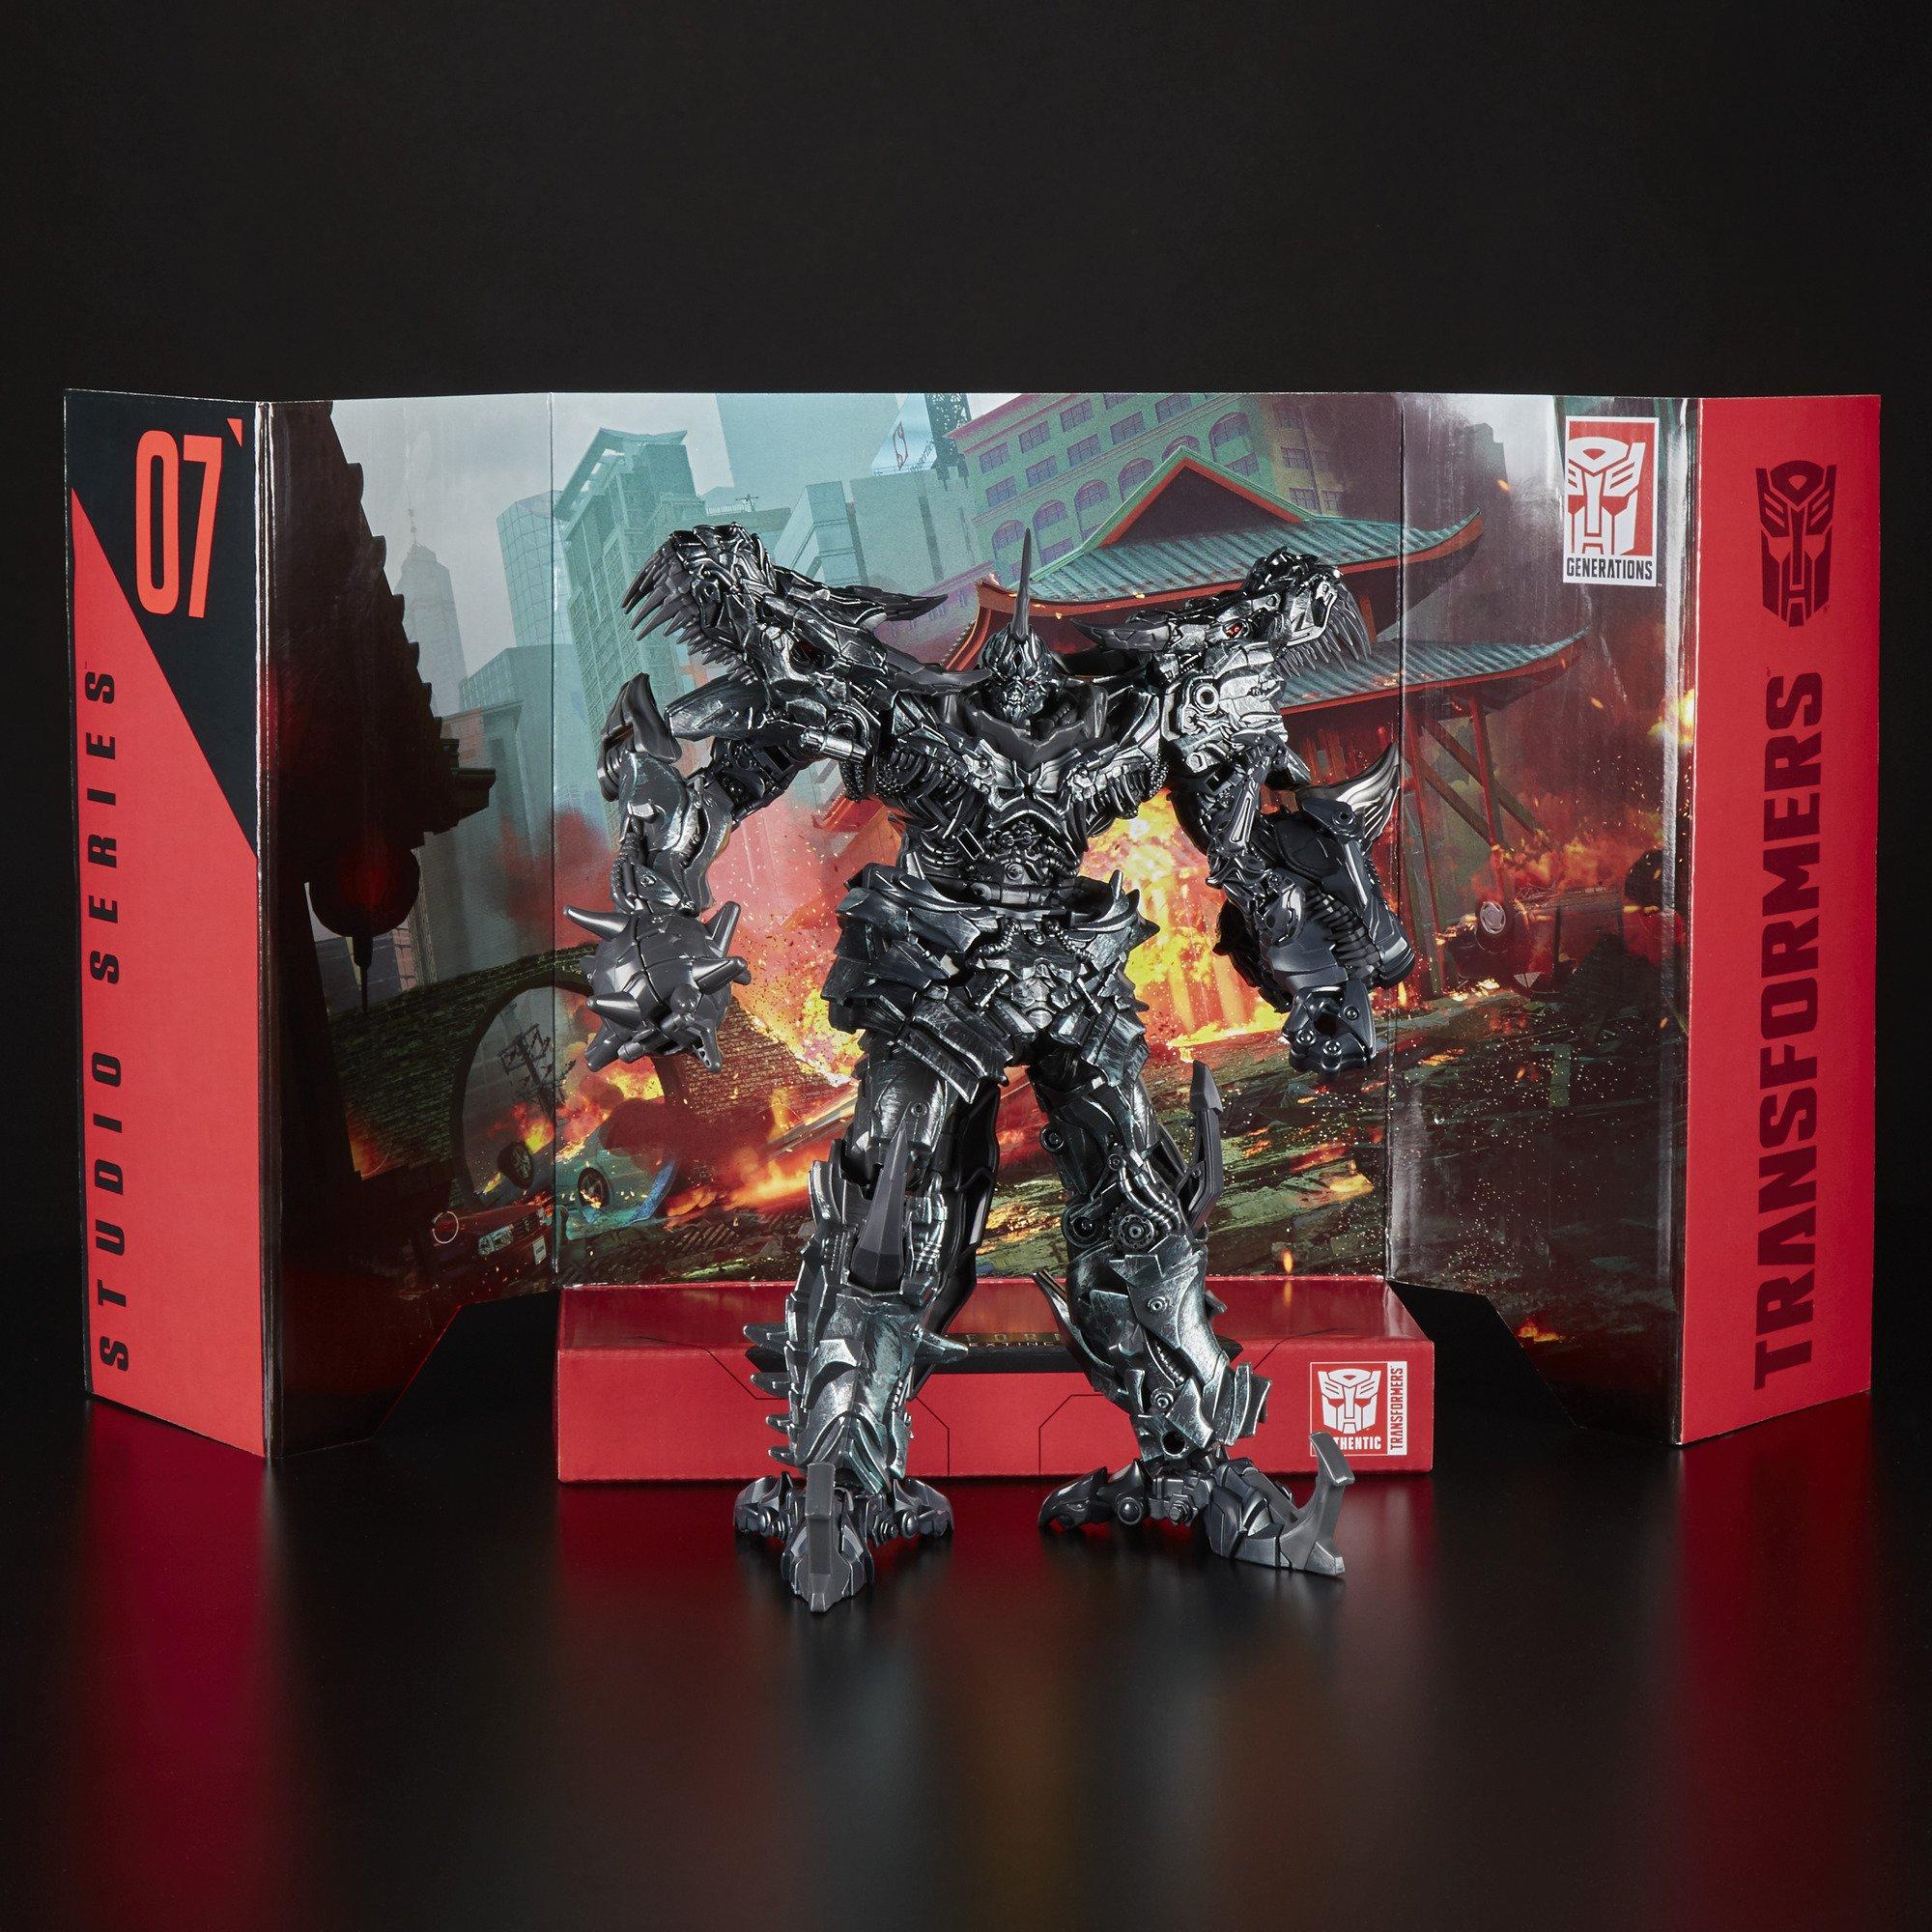 Transformers Studio Series 07 Leader Class Movie 4 Grimlock by Transformers (Image #6)